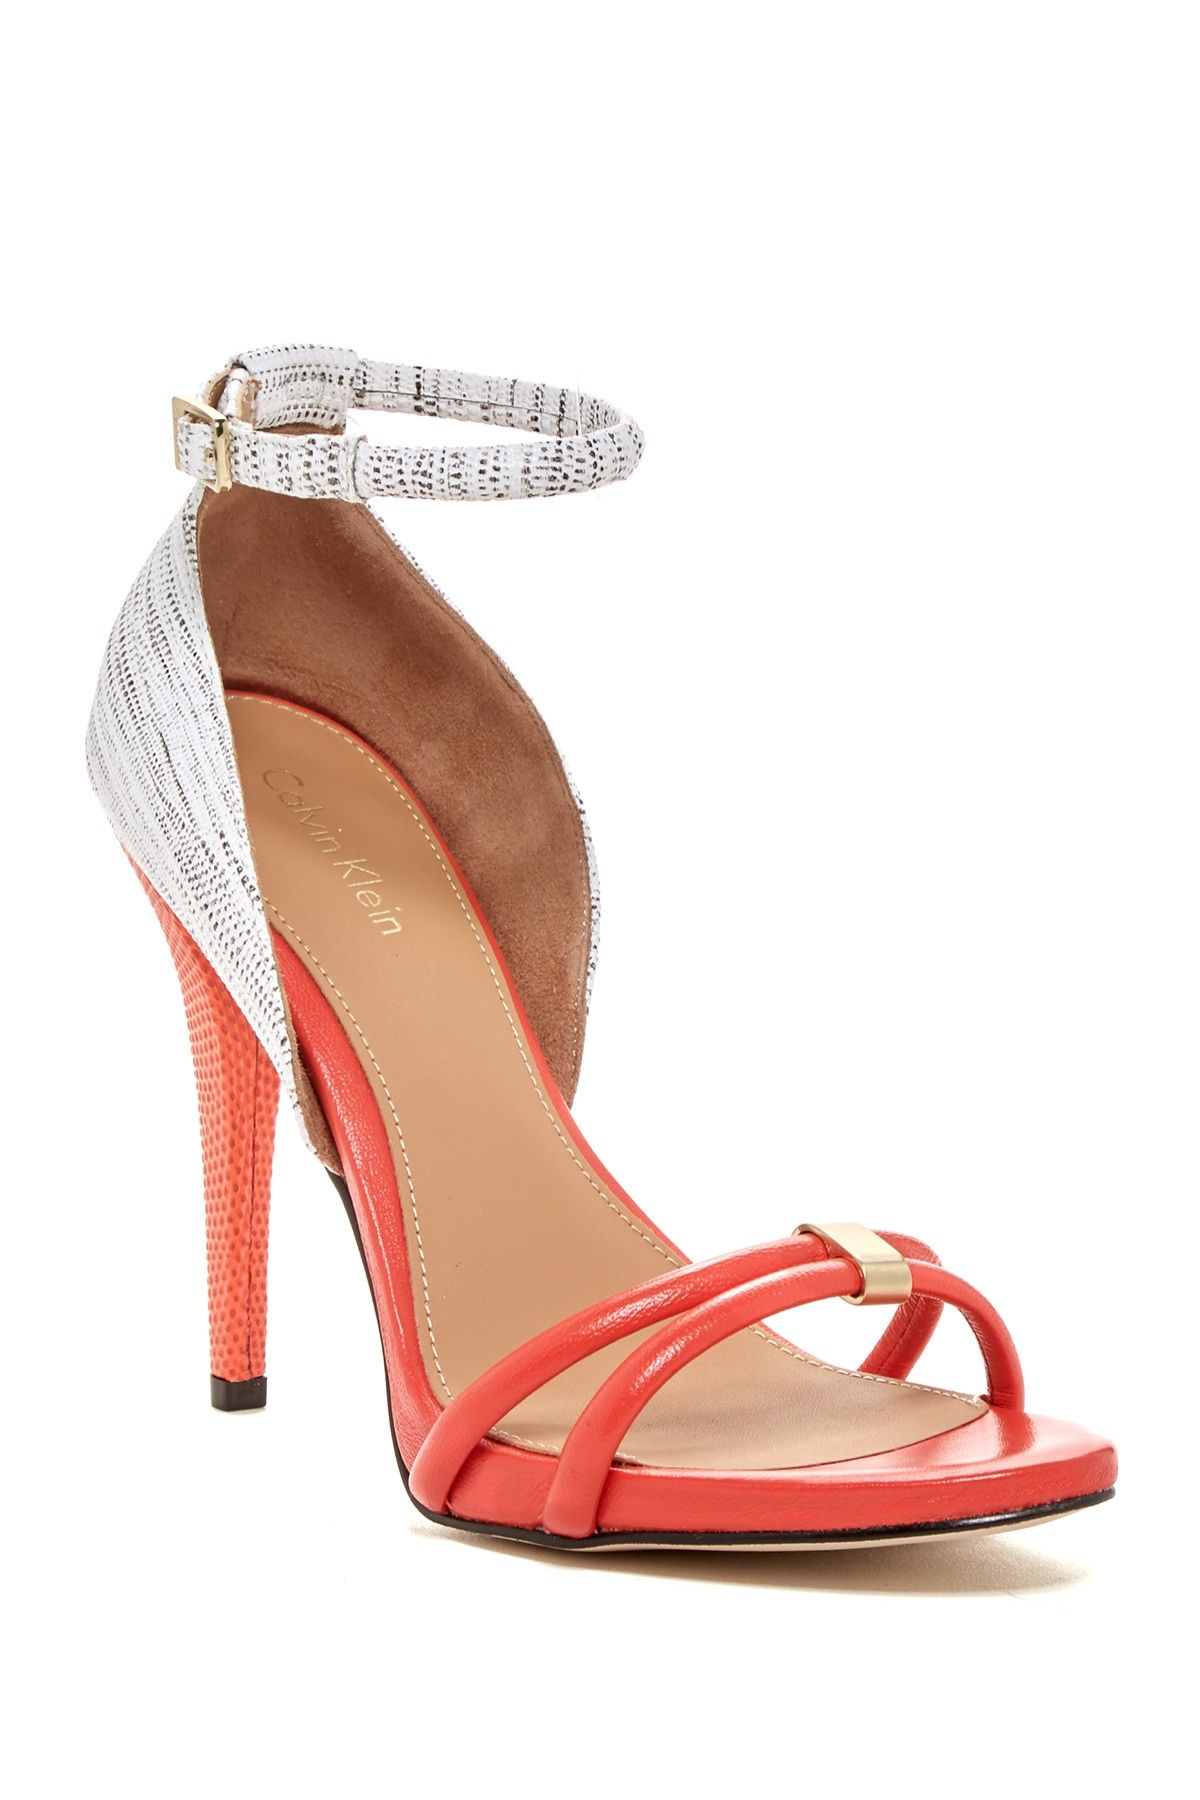 164182465c5 Calvin Klein - Nathali Open Toe Sandal at Nordstrom Rack. Free Shipping on